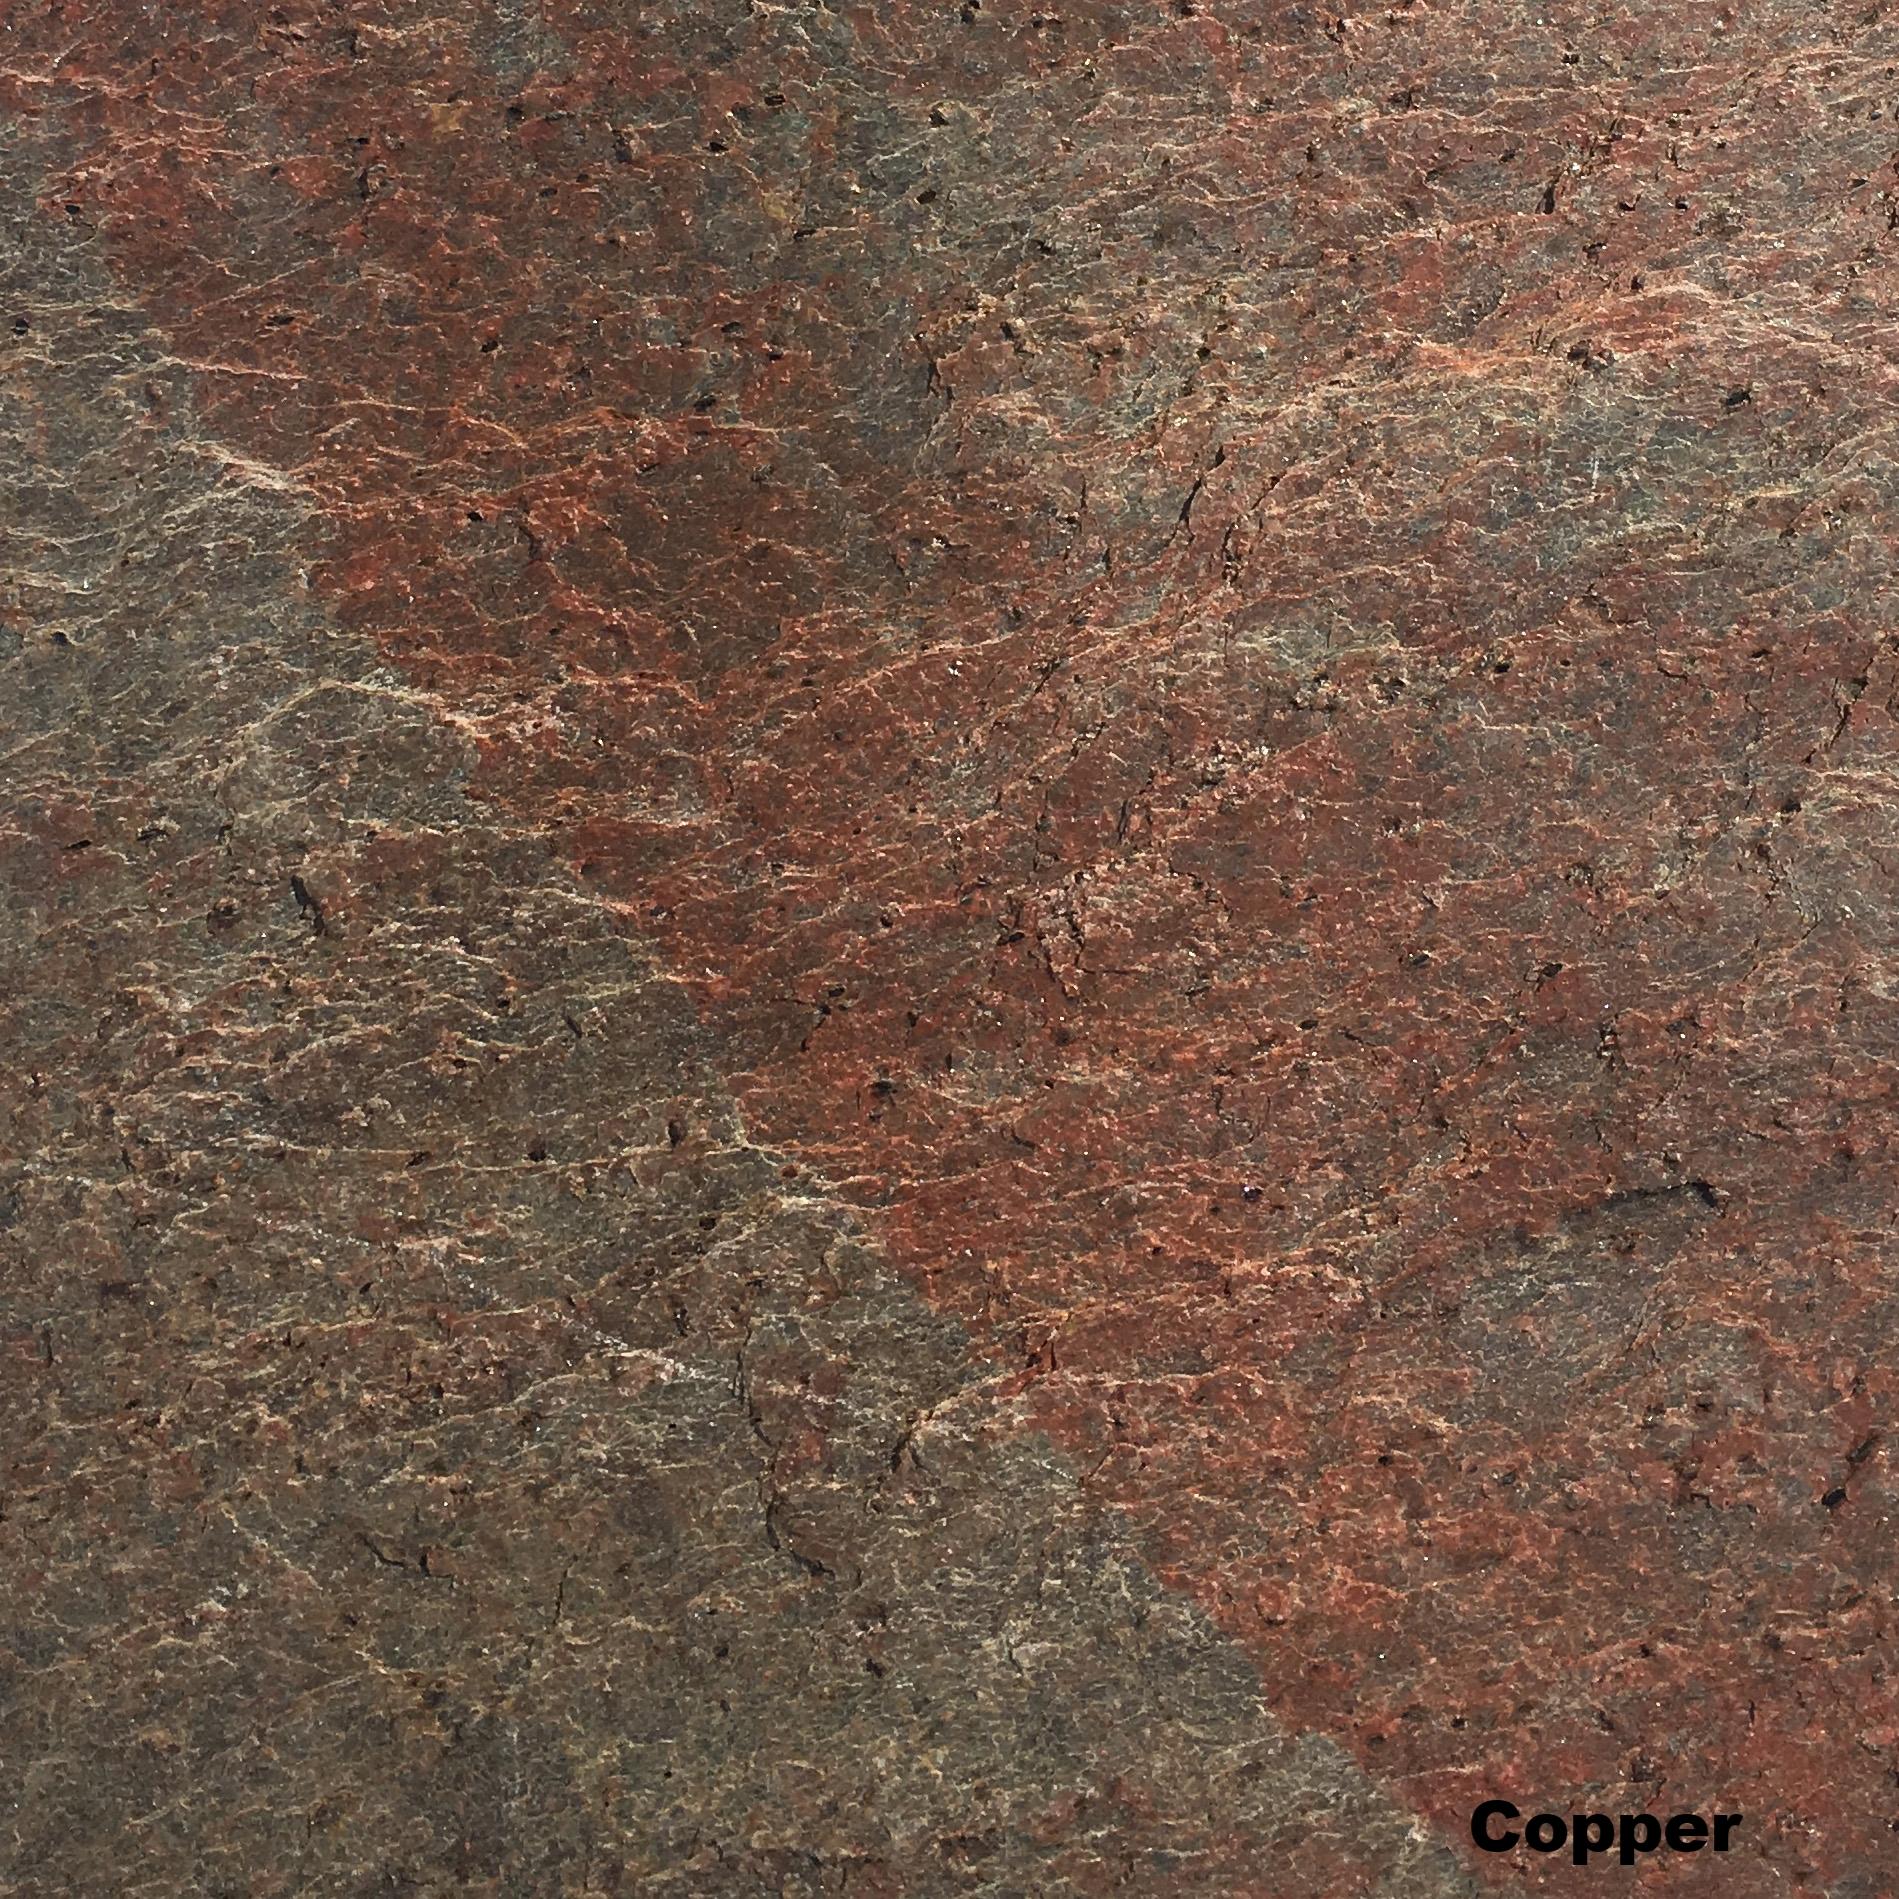 Copper 200.JPG